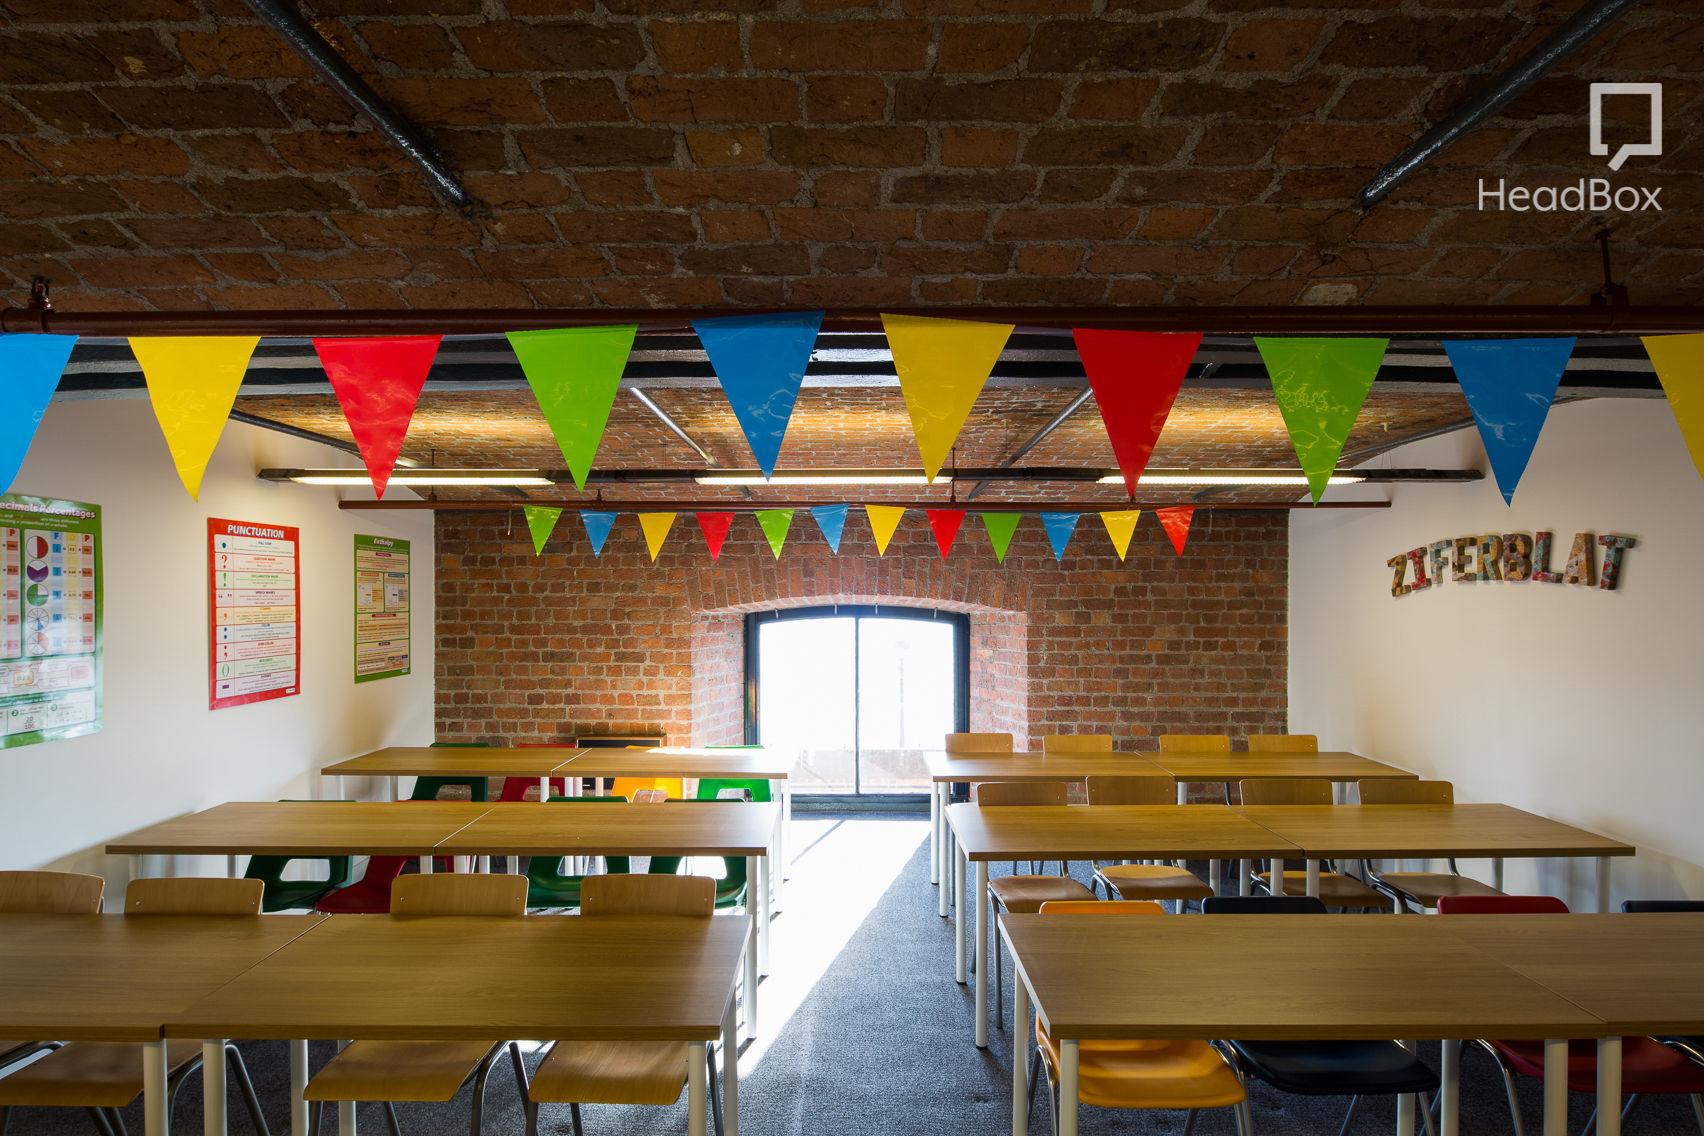 The Classroom, Ziferblat Liverpool